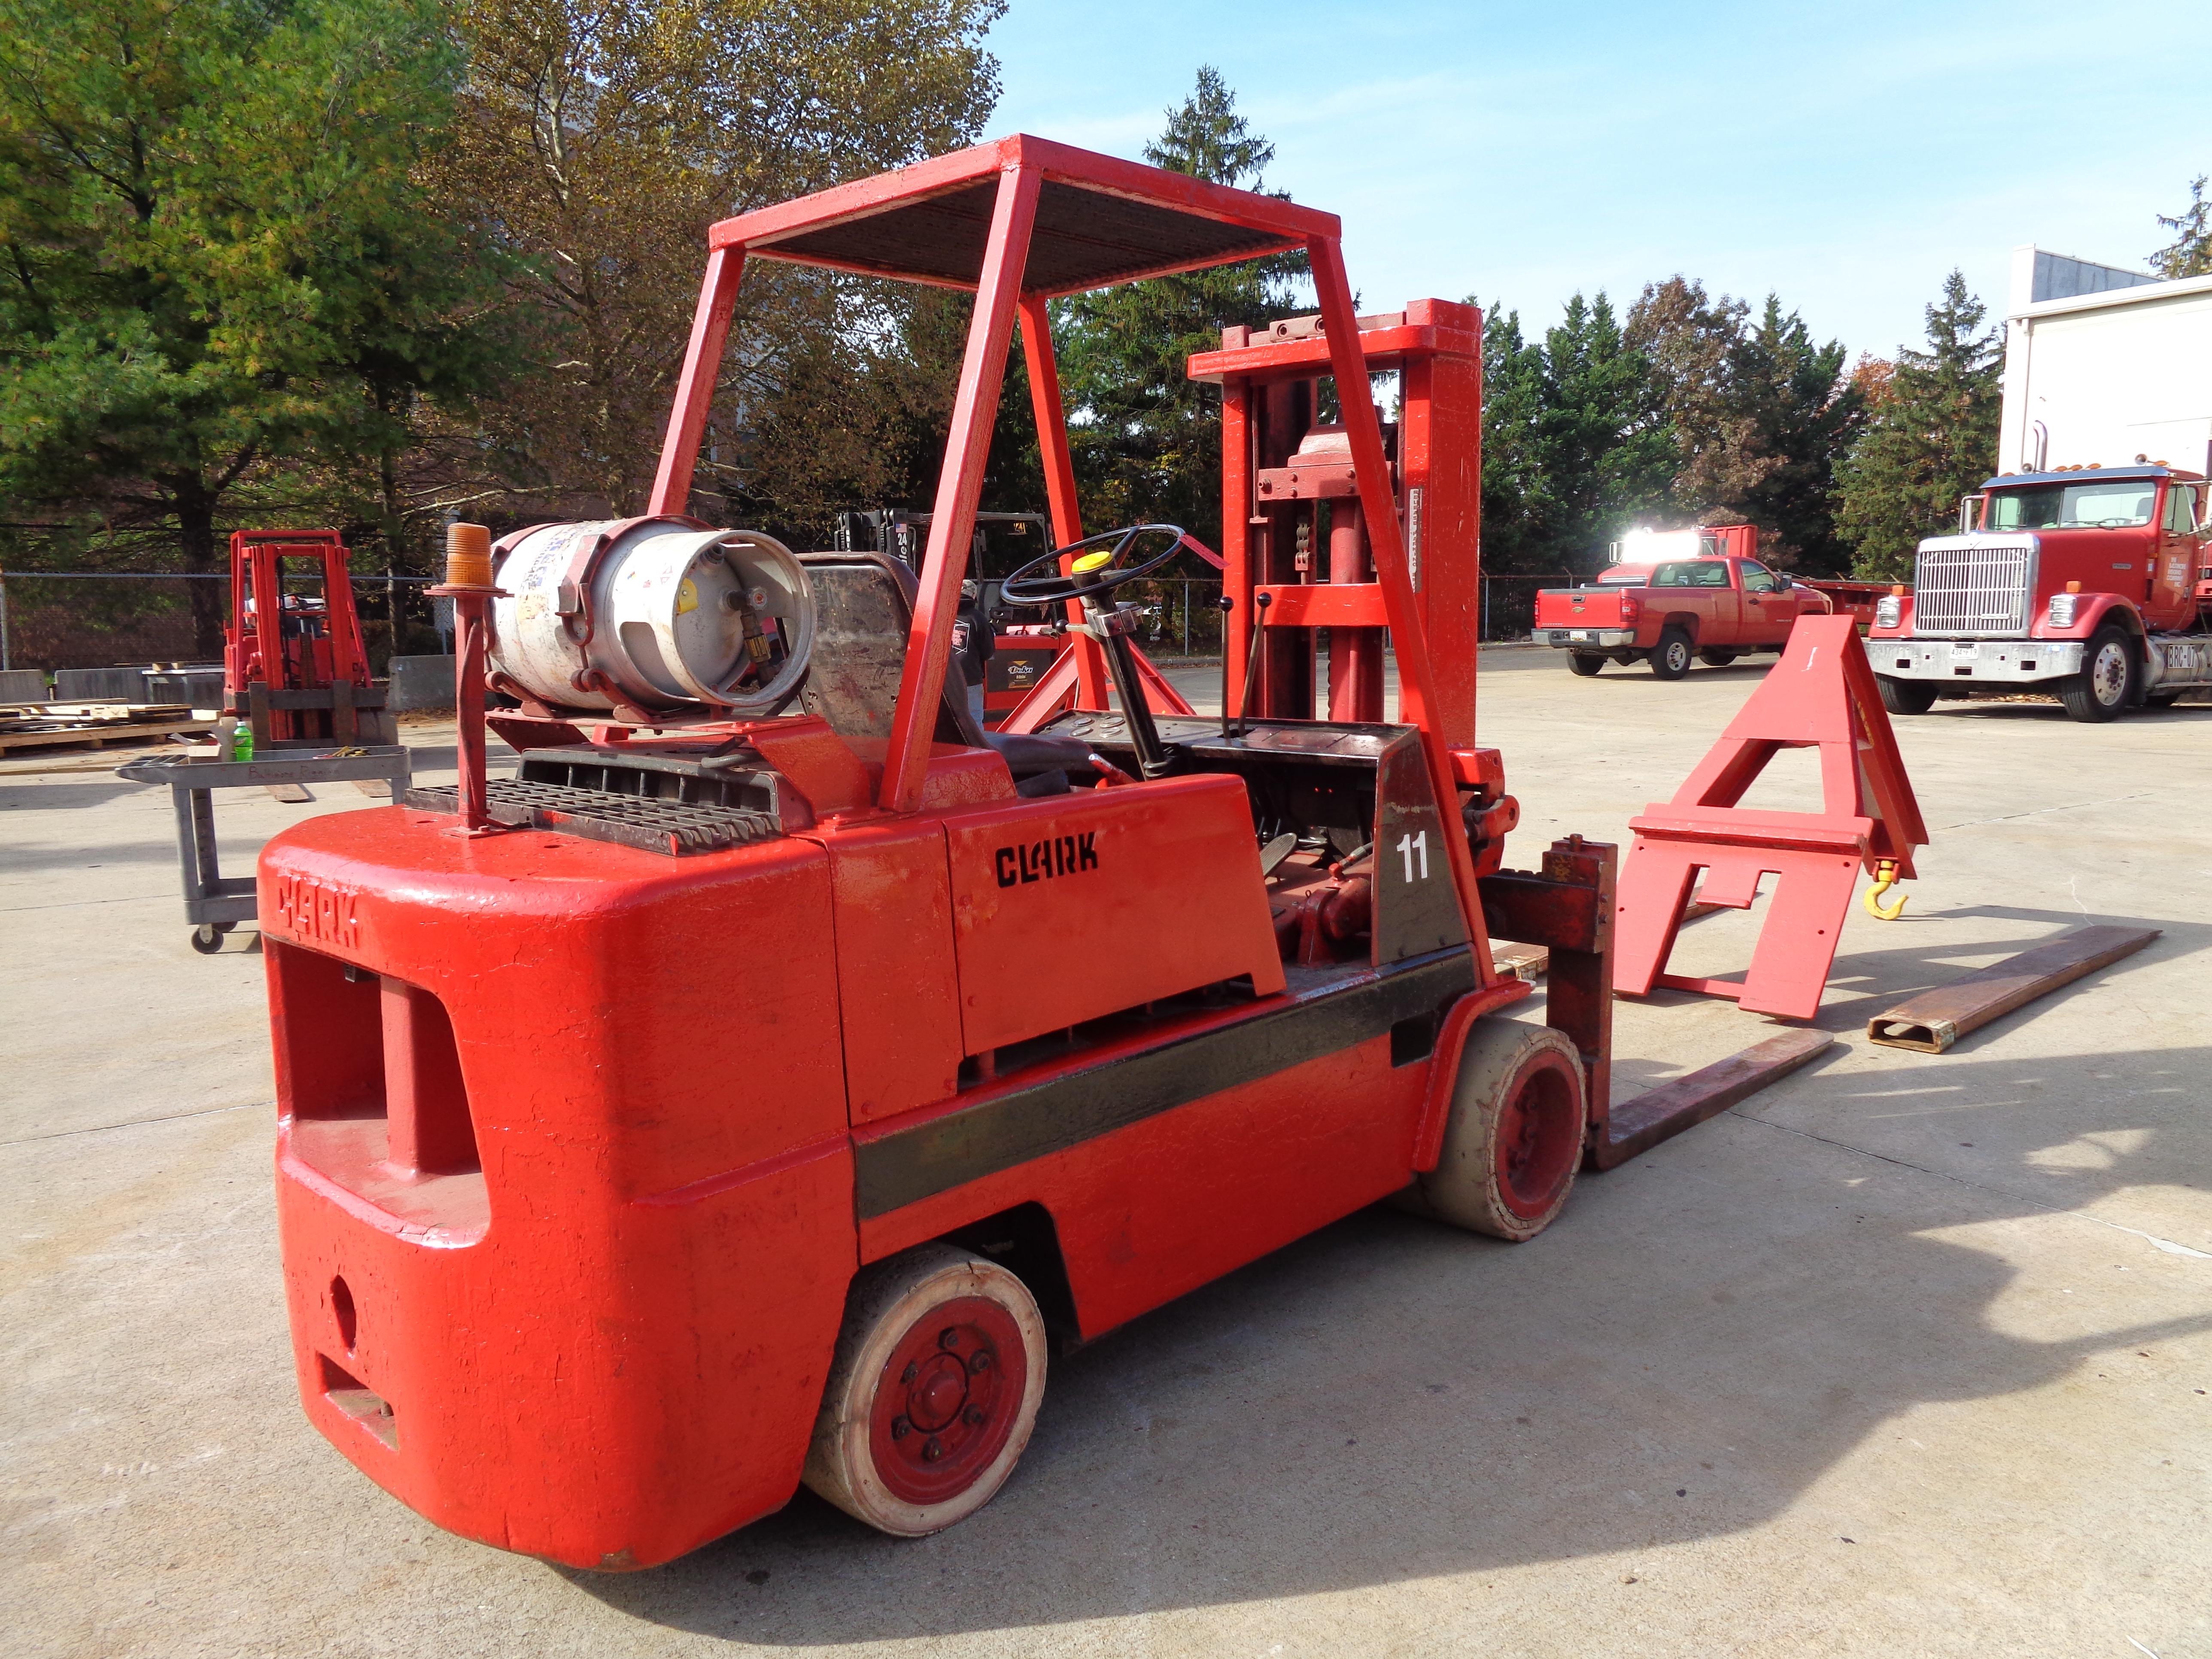 Clark C500-120 Forklift plus boom - 12,000 lbs - Image 4 of 11